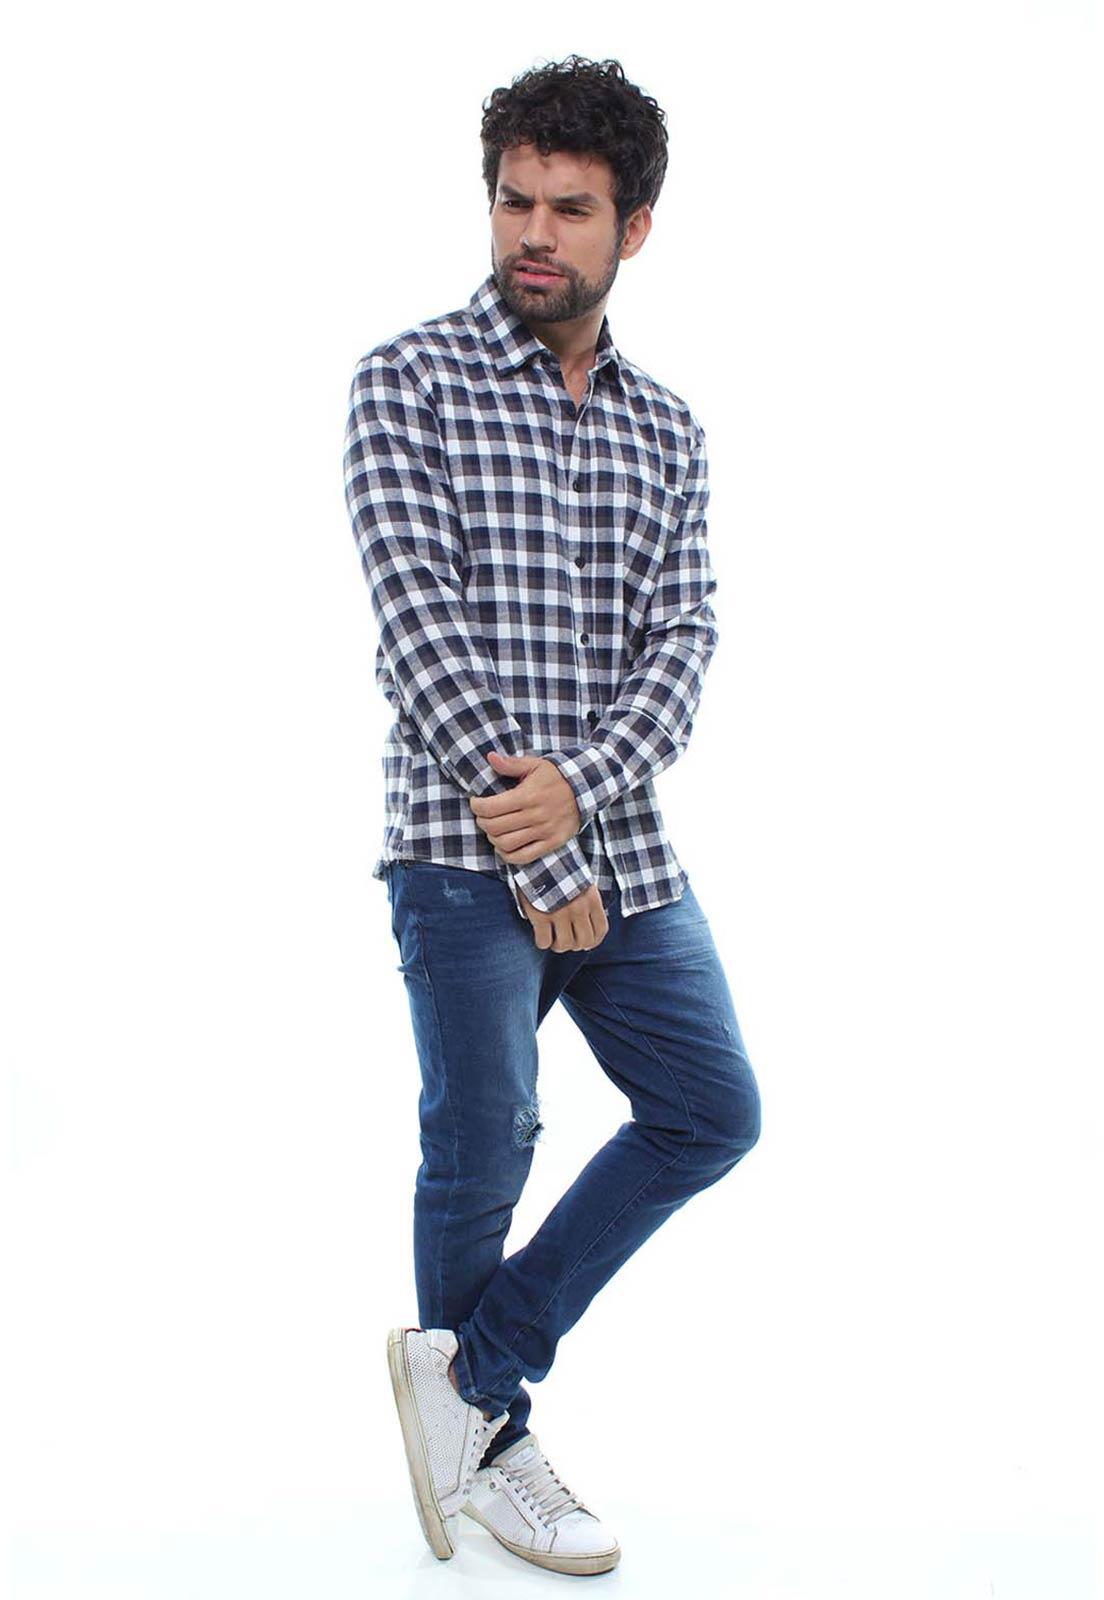 Camisa Masculina Flanelada Manga Longa Xadrez Crocker - 46884  - CROCKER JEANS